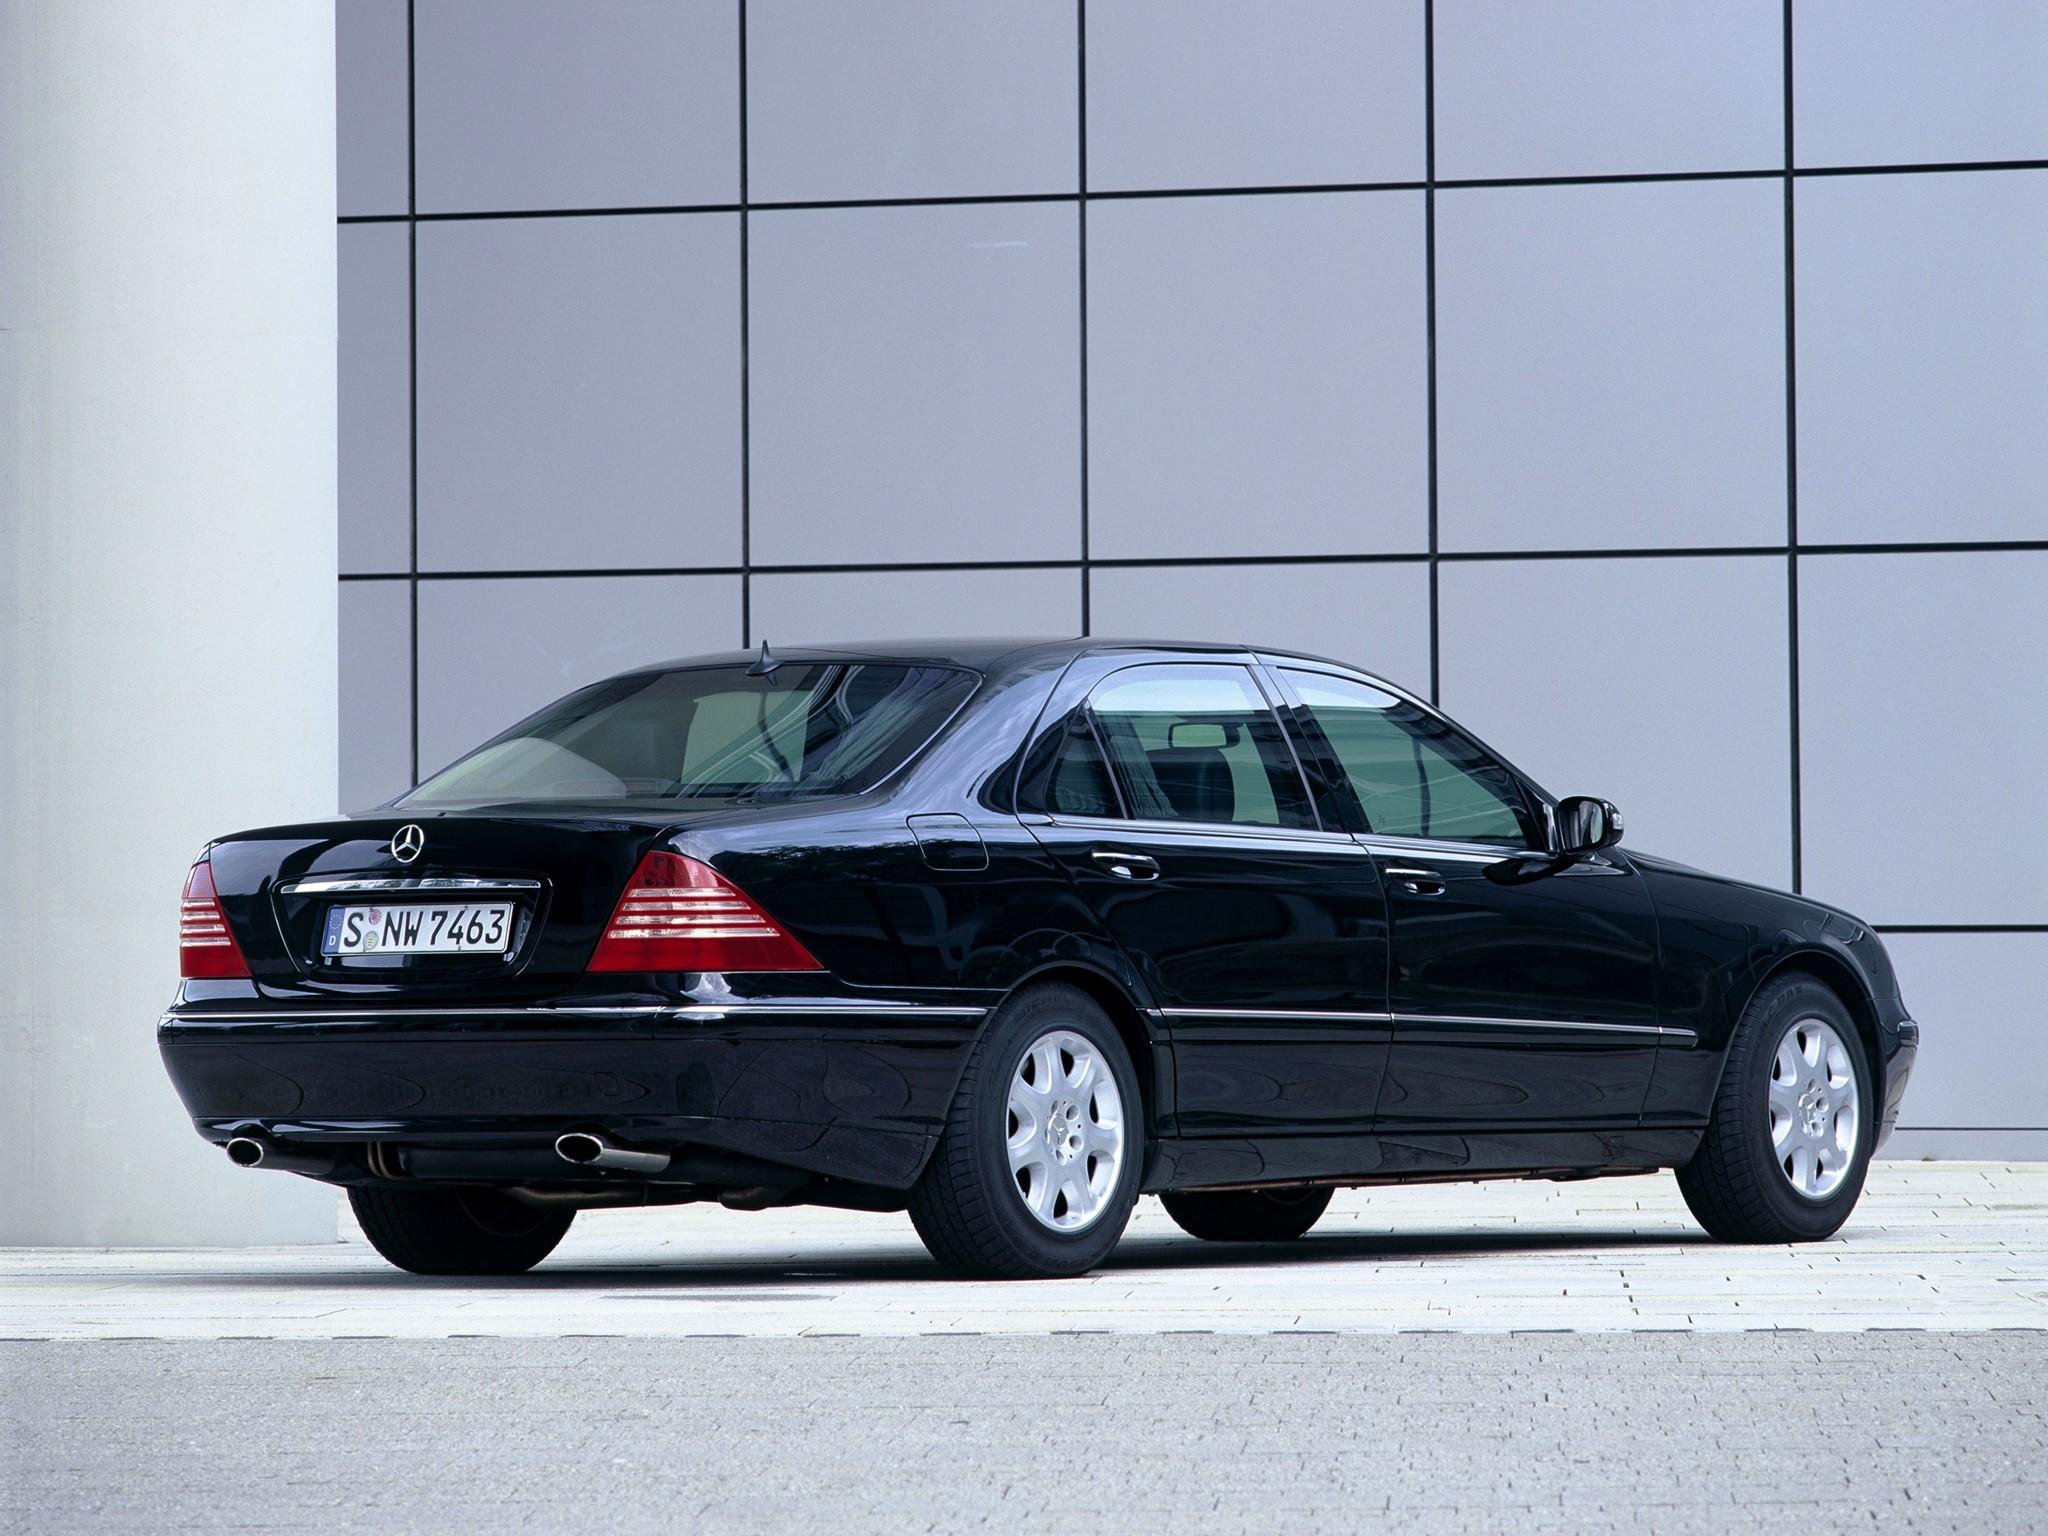 2002 Armored Mercedes Benz S-Klasse Guard W220 luxury g ...